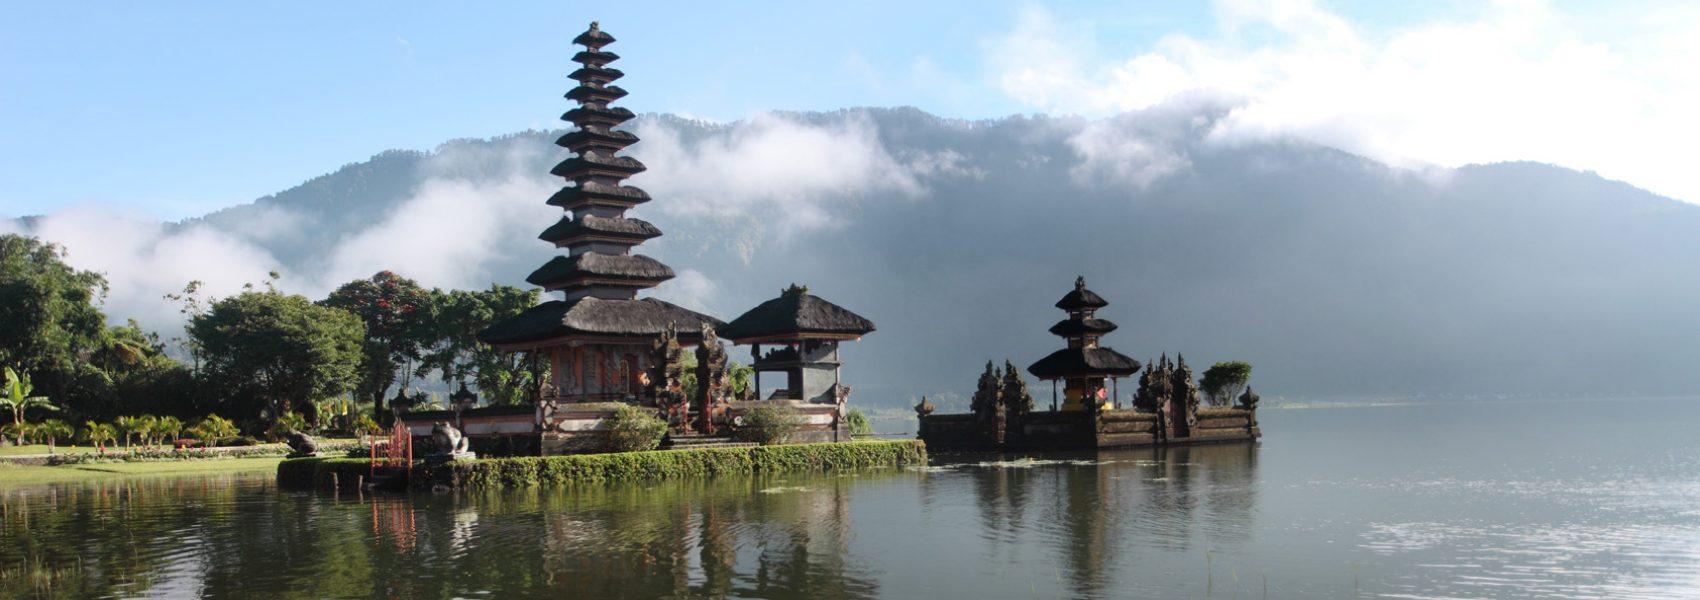 Cheap Flights To Denpasar Indonesia From Jakarta 78rt